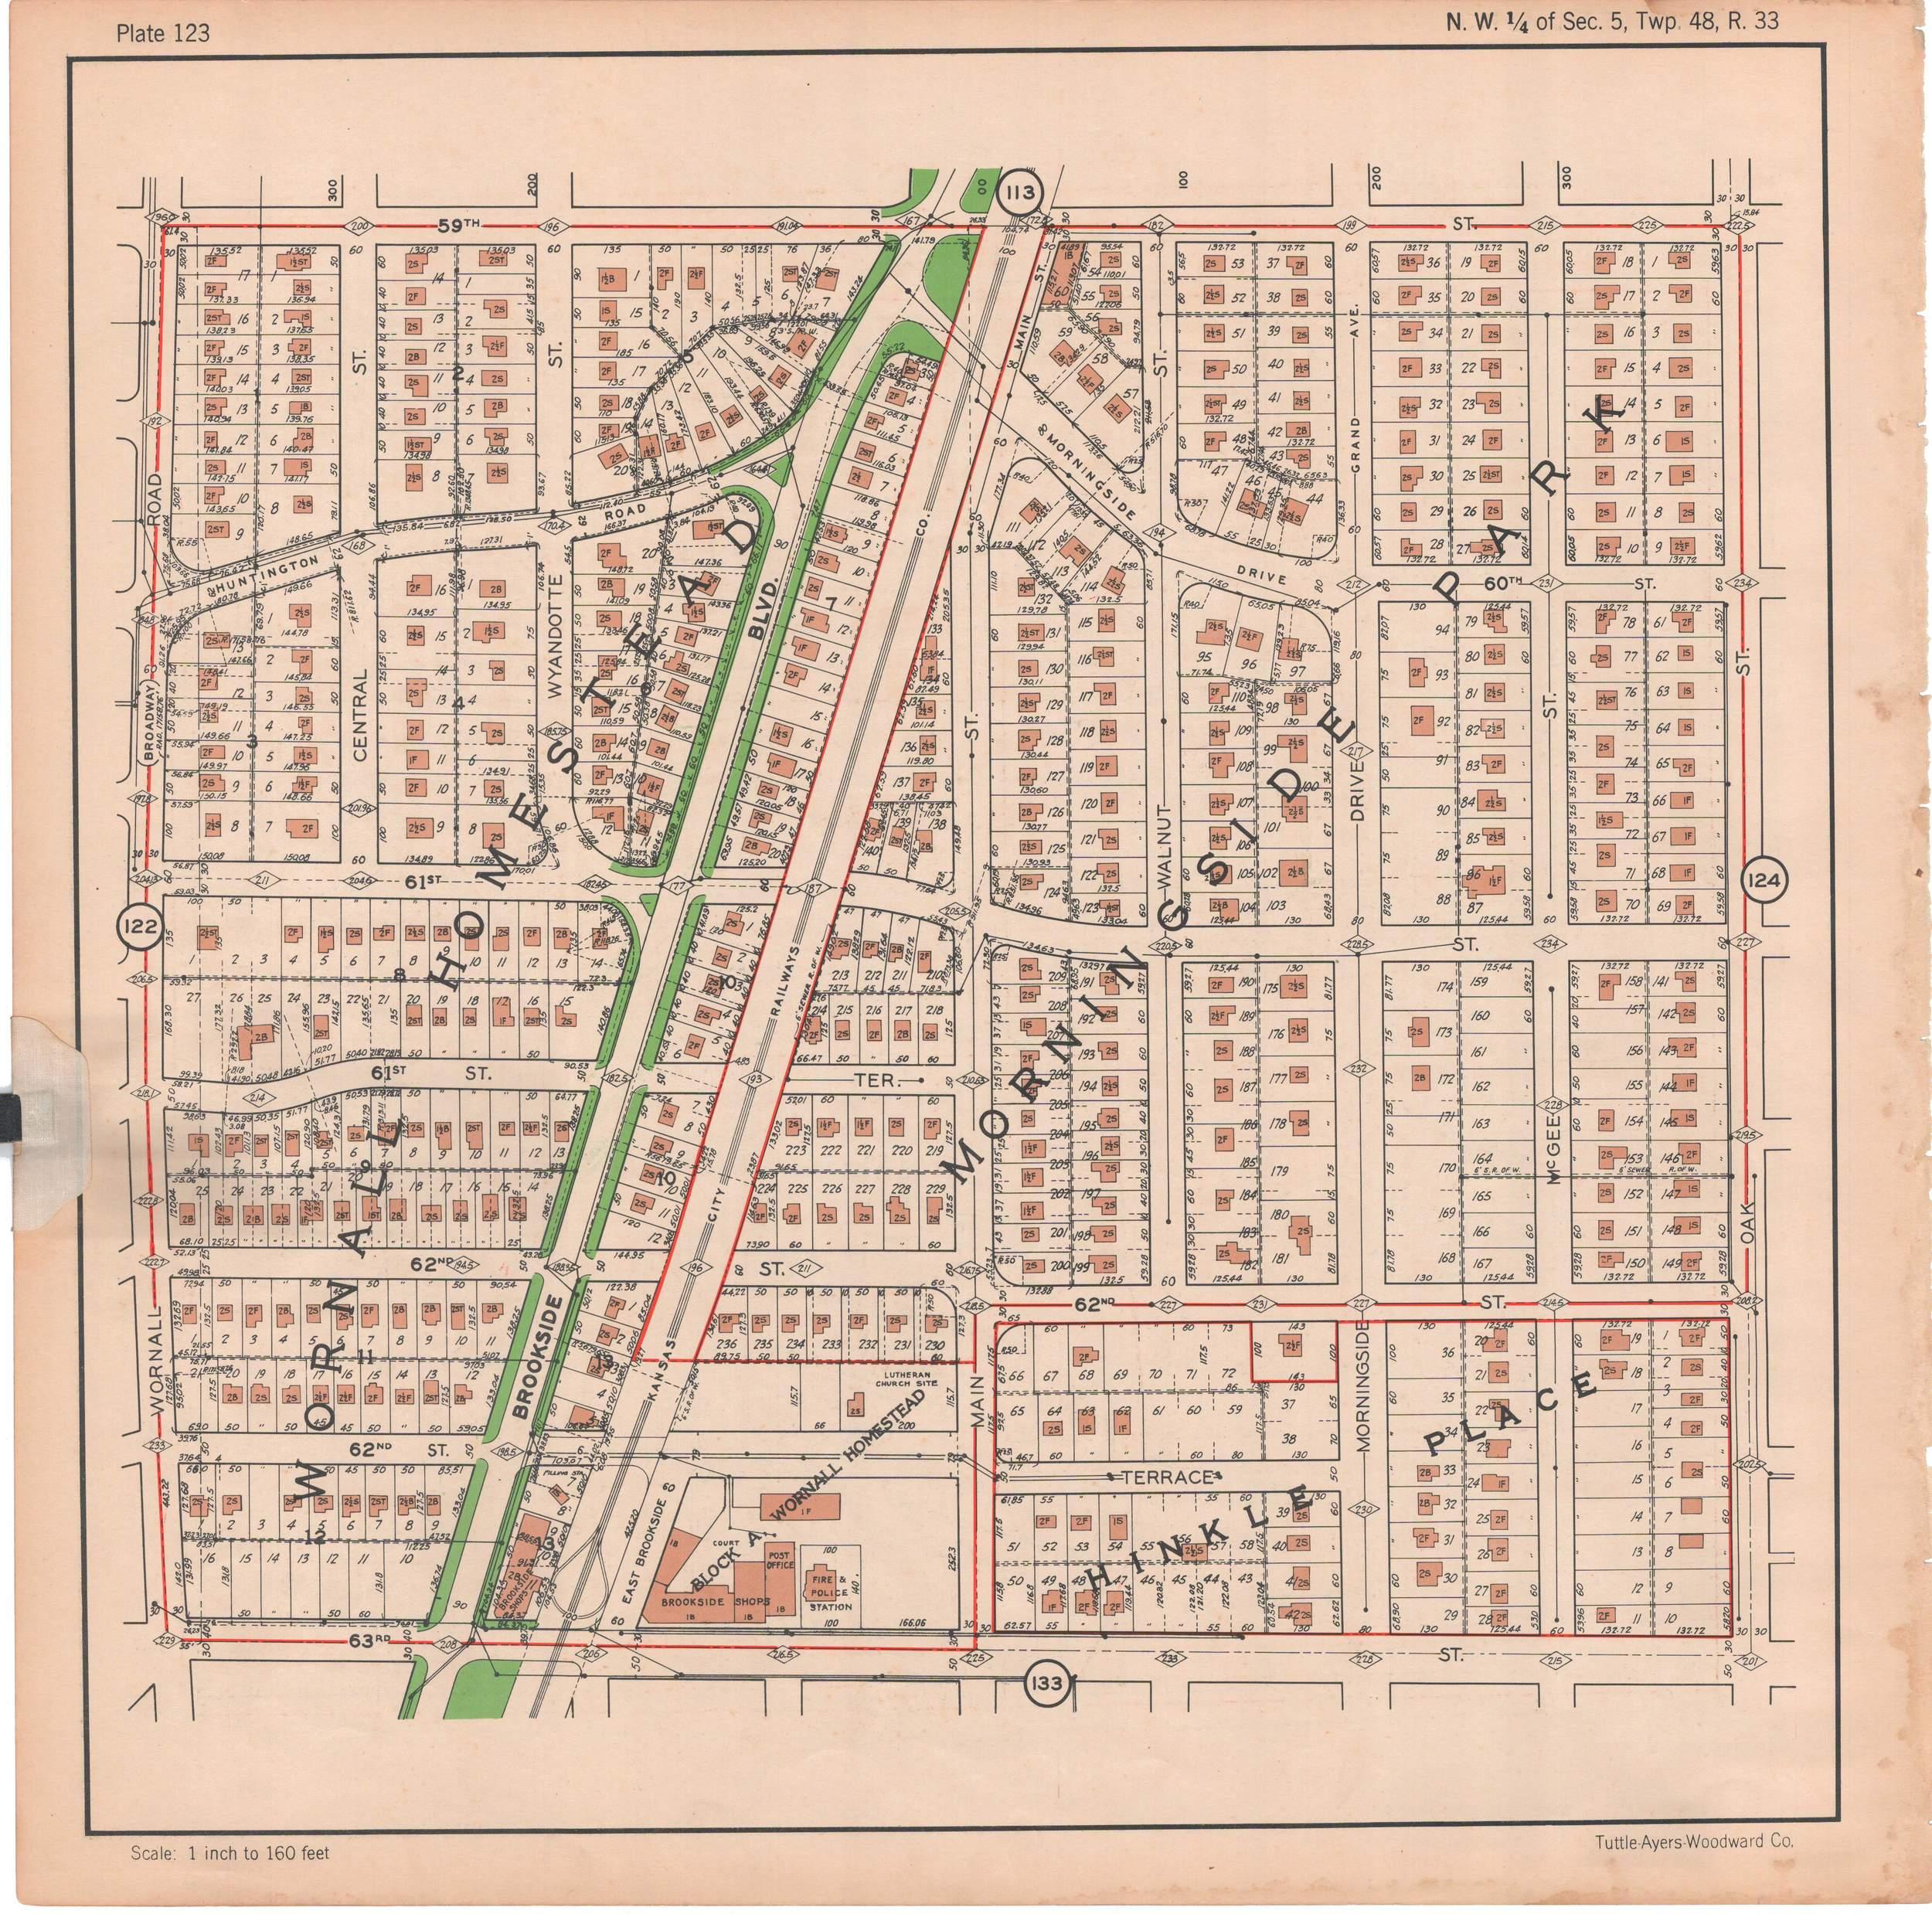 1925 TUTTLE_AYERS_Plate 123.JPG